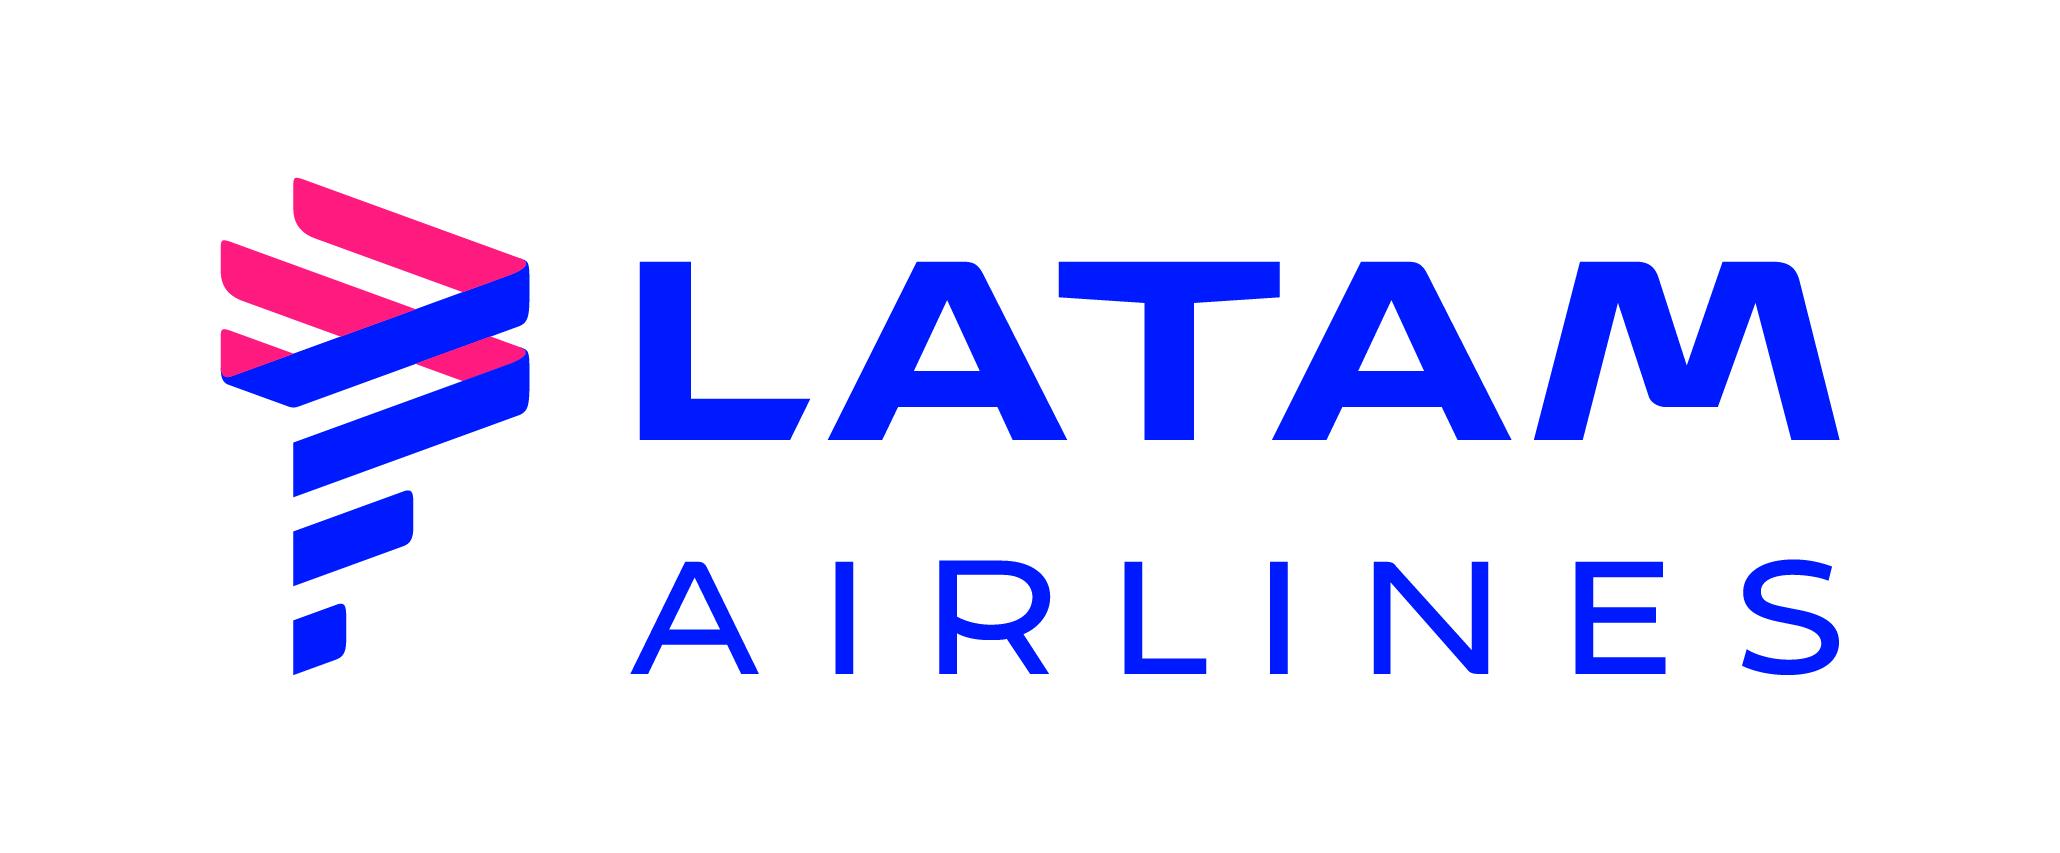 Latam airlines horizontal positivo cmyk